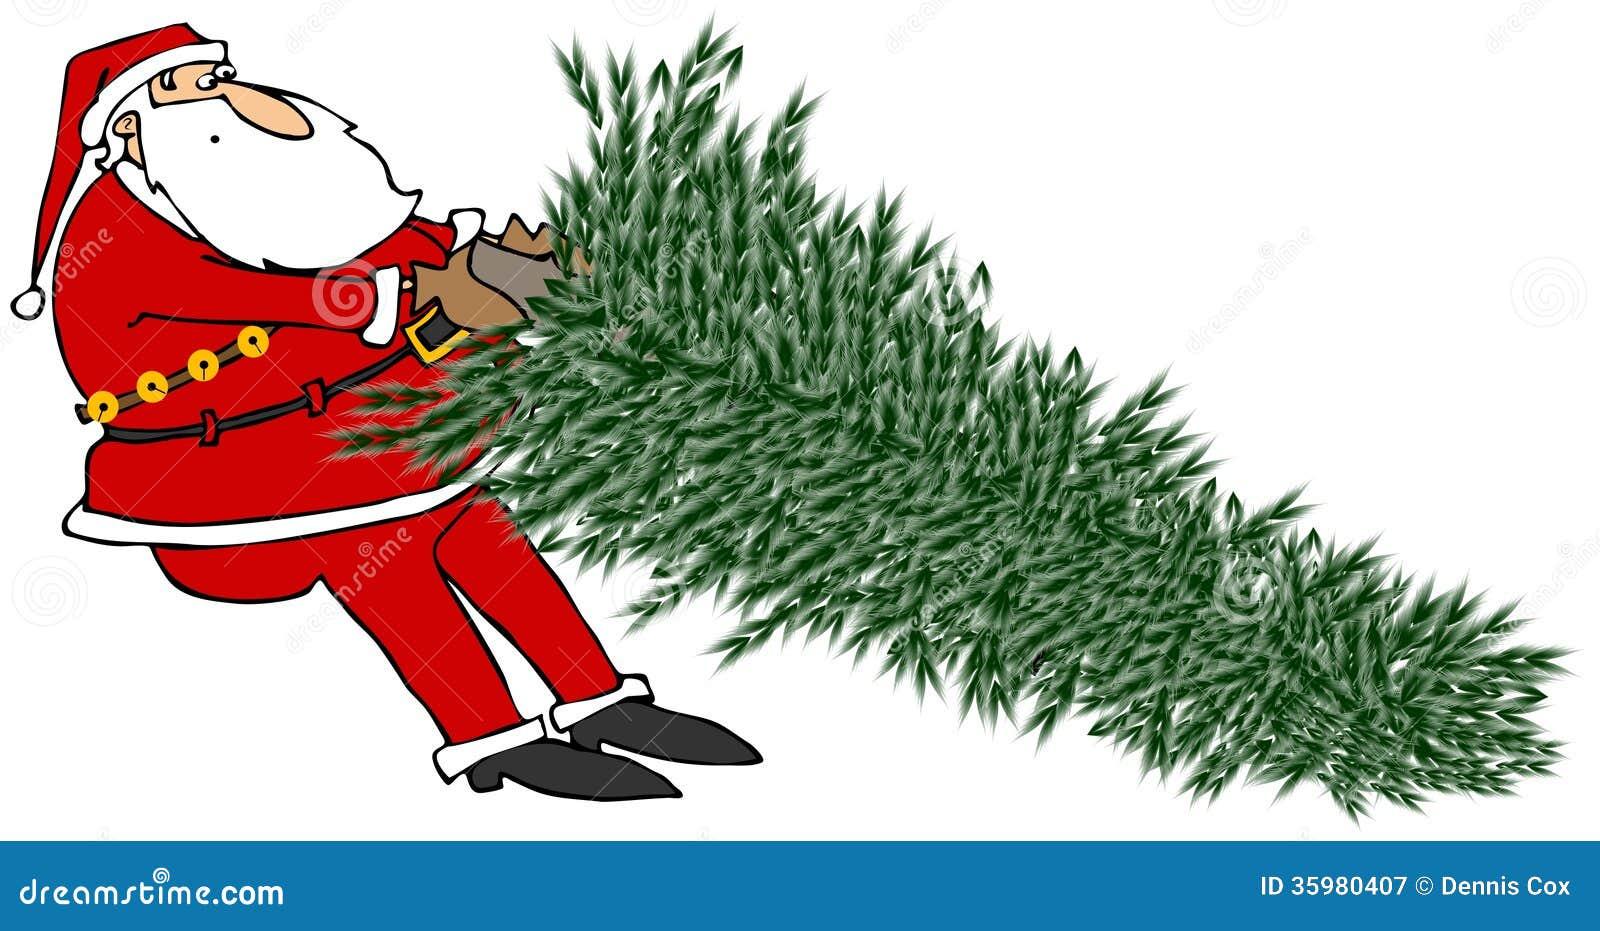 Pull Up Christmas Tree